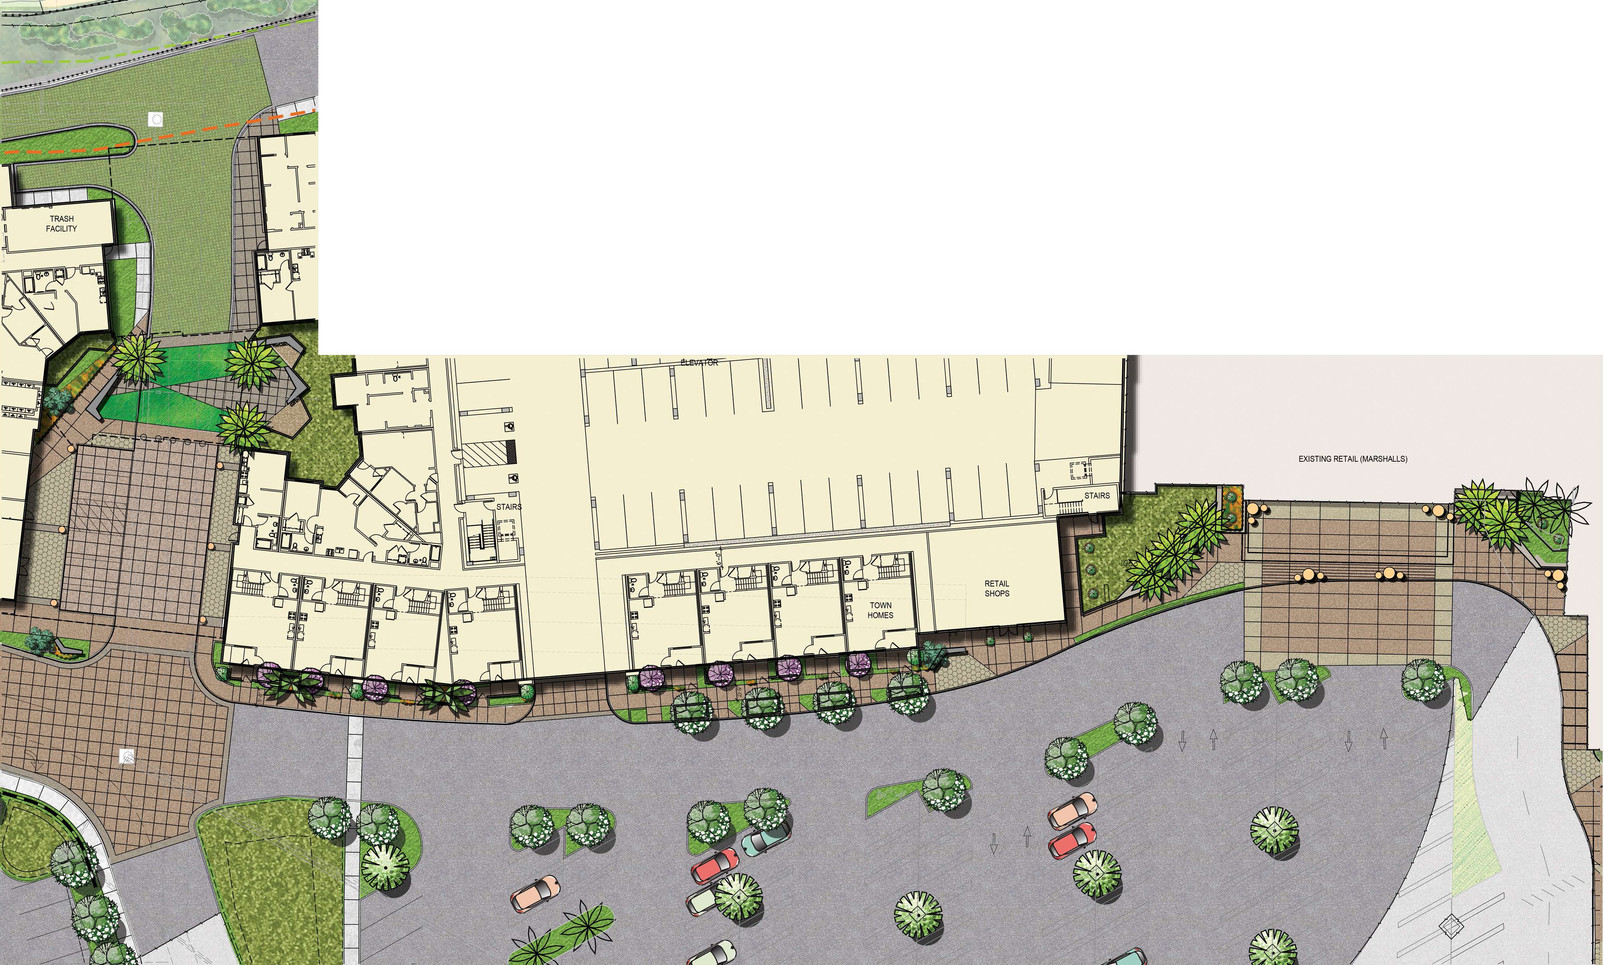 North County Plaza Retail Cooridor Enlargement